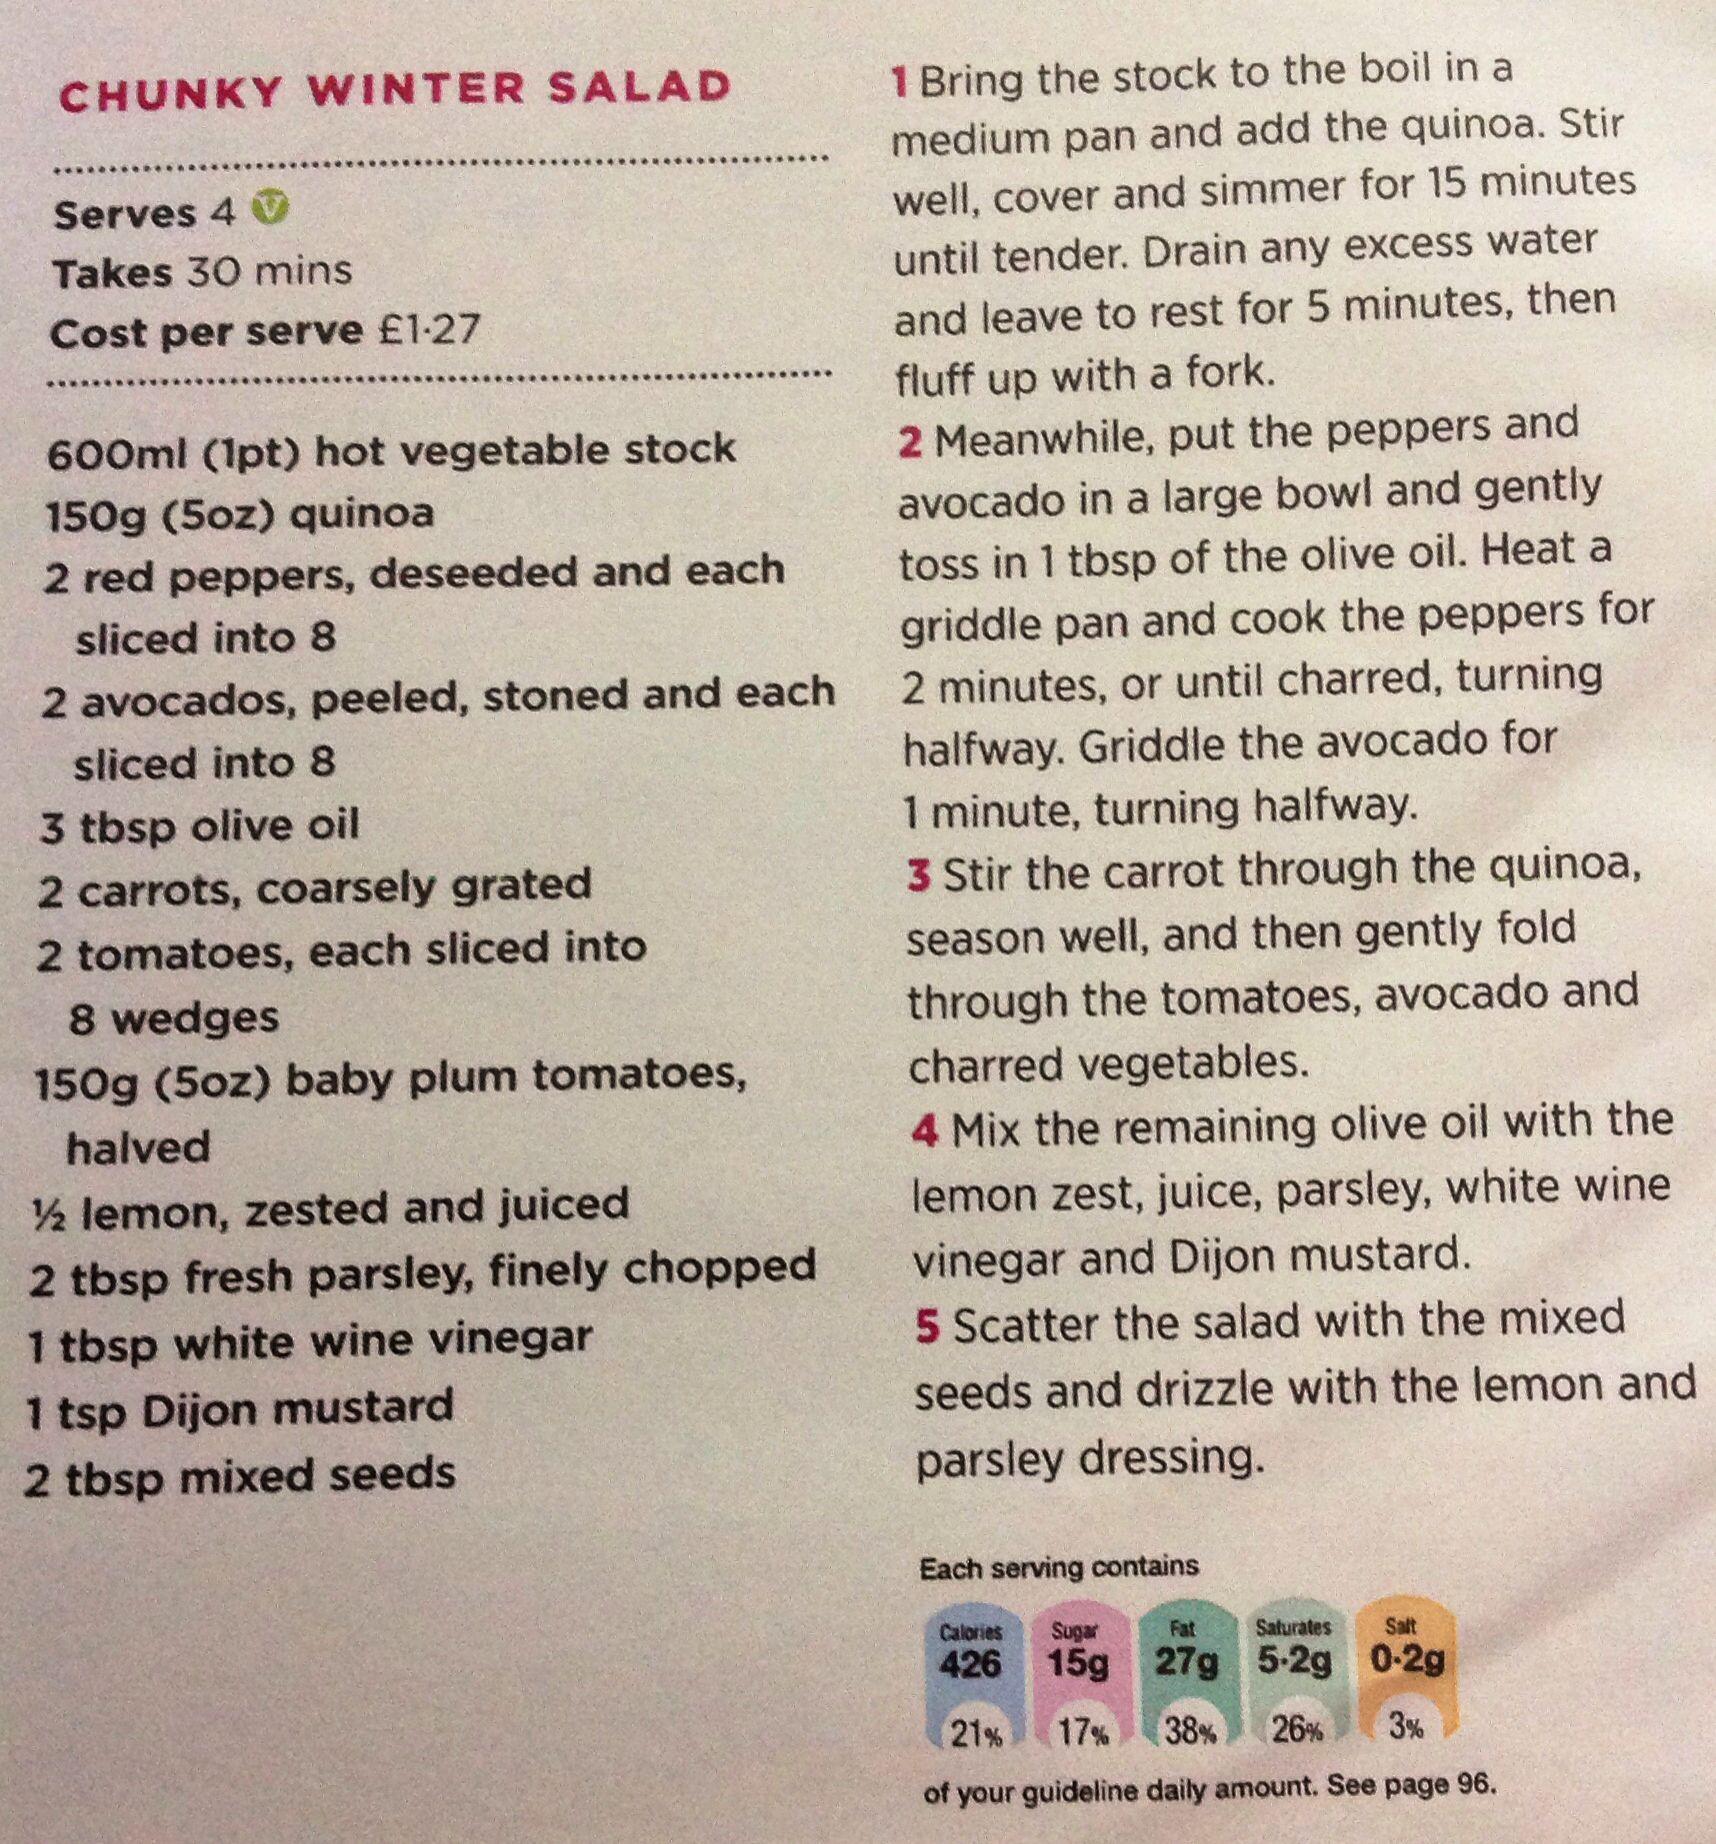 Chunky winter salad